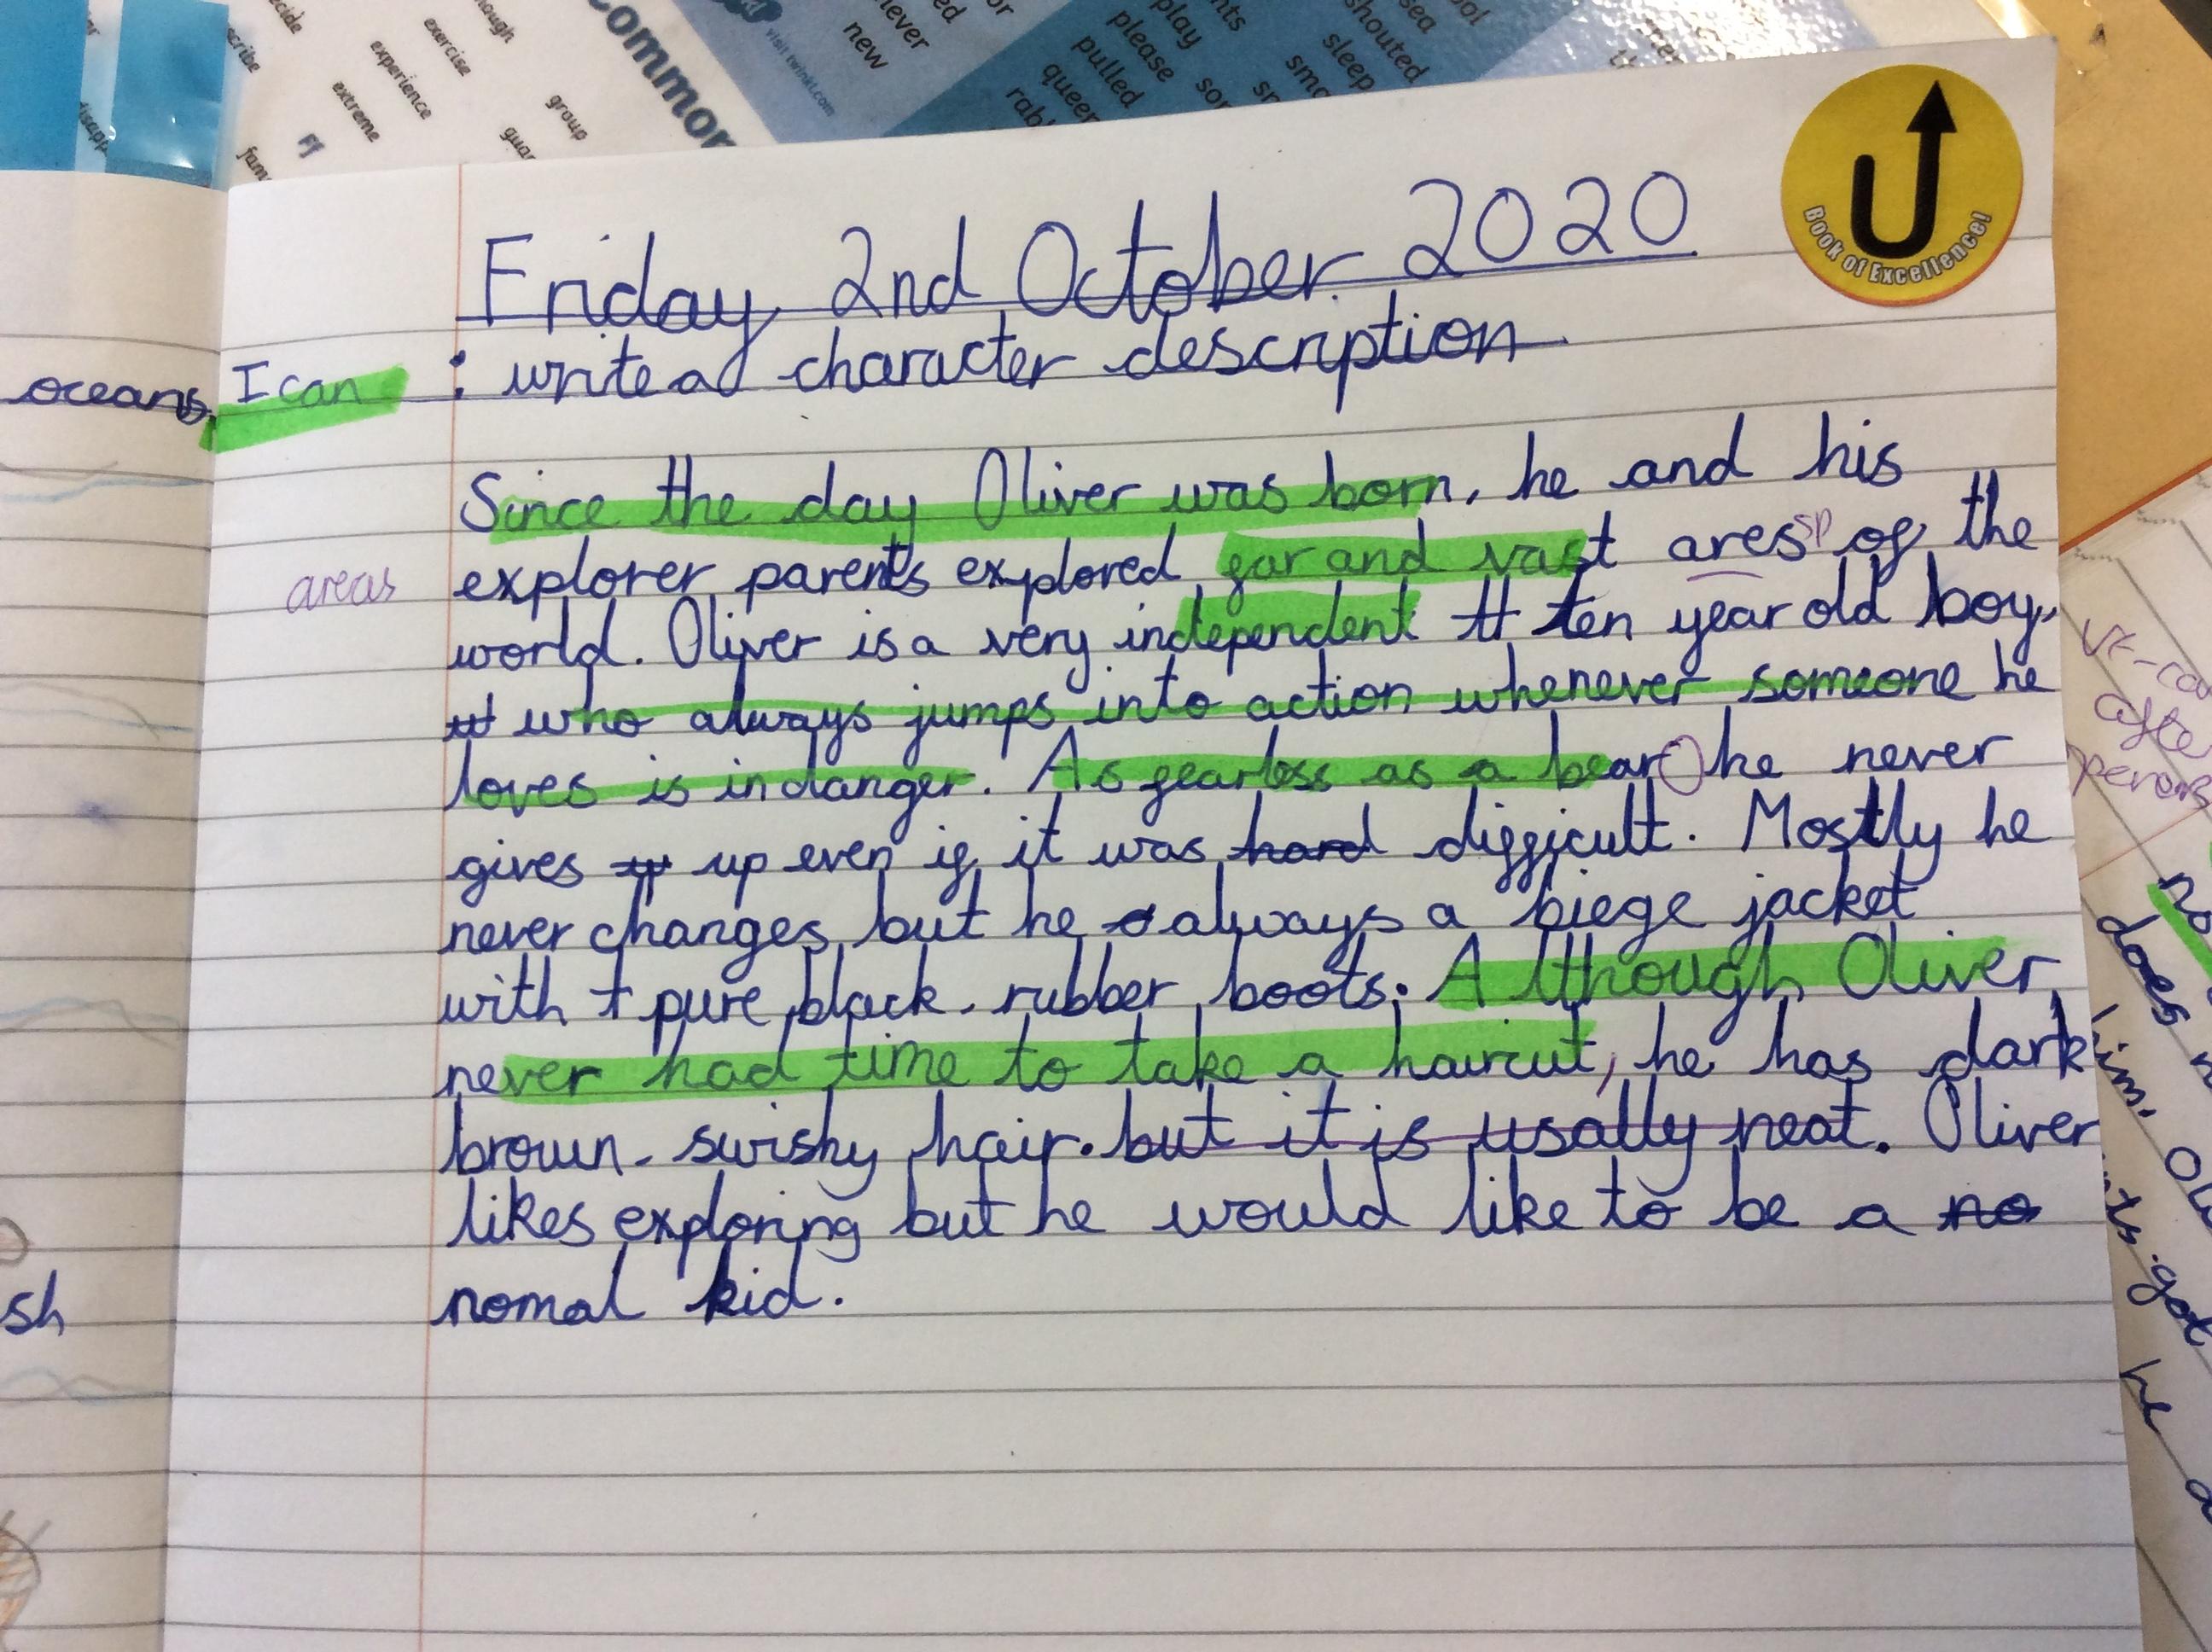 Millie - brilliant writing!